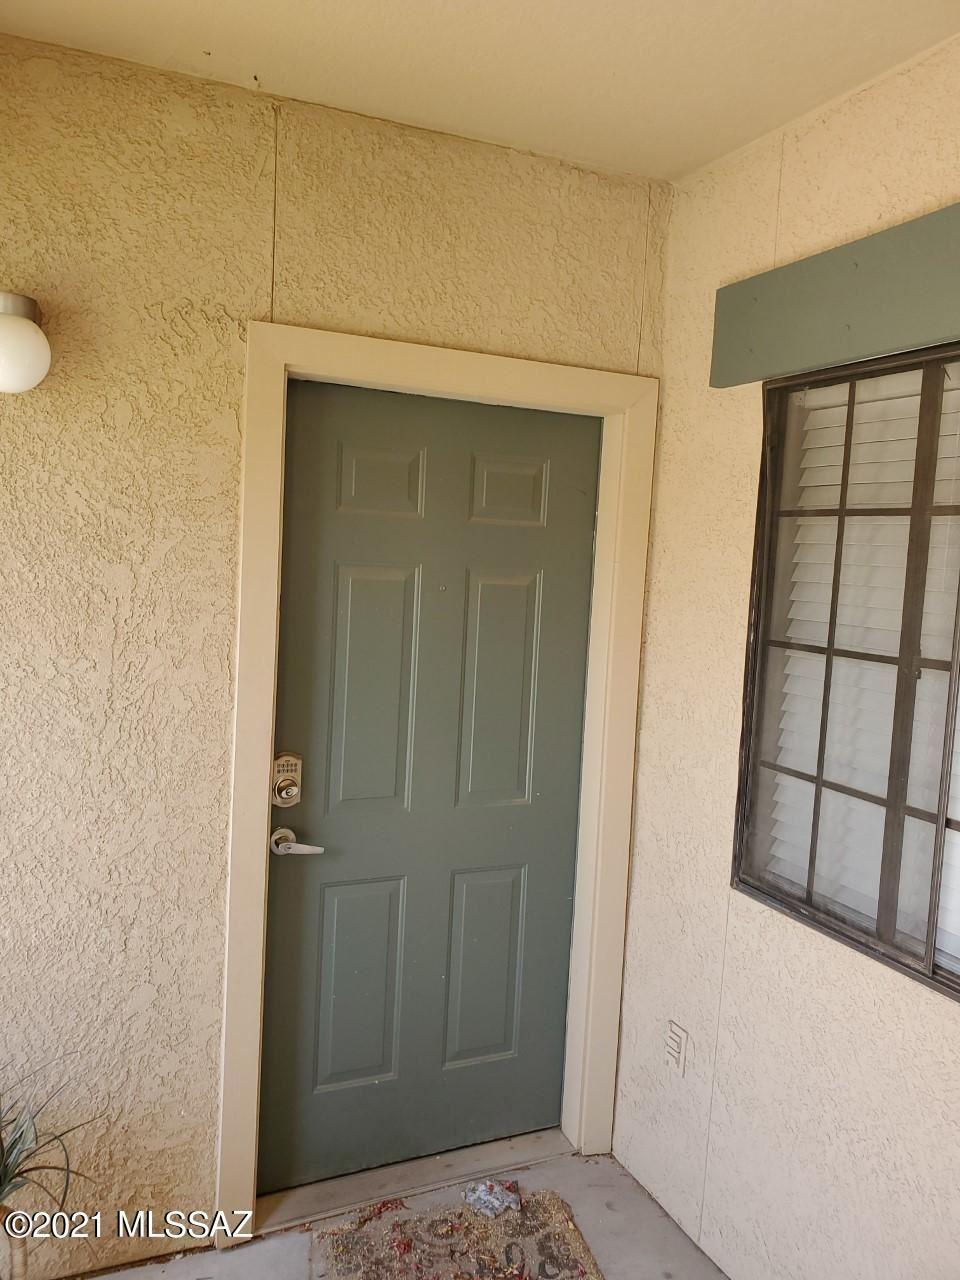 101 S Players Club Drive #21103, Tucson, AZ 85745 - MLS#: 22117770